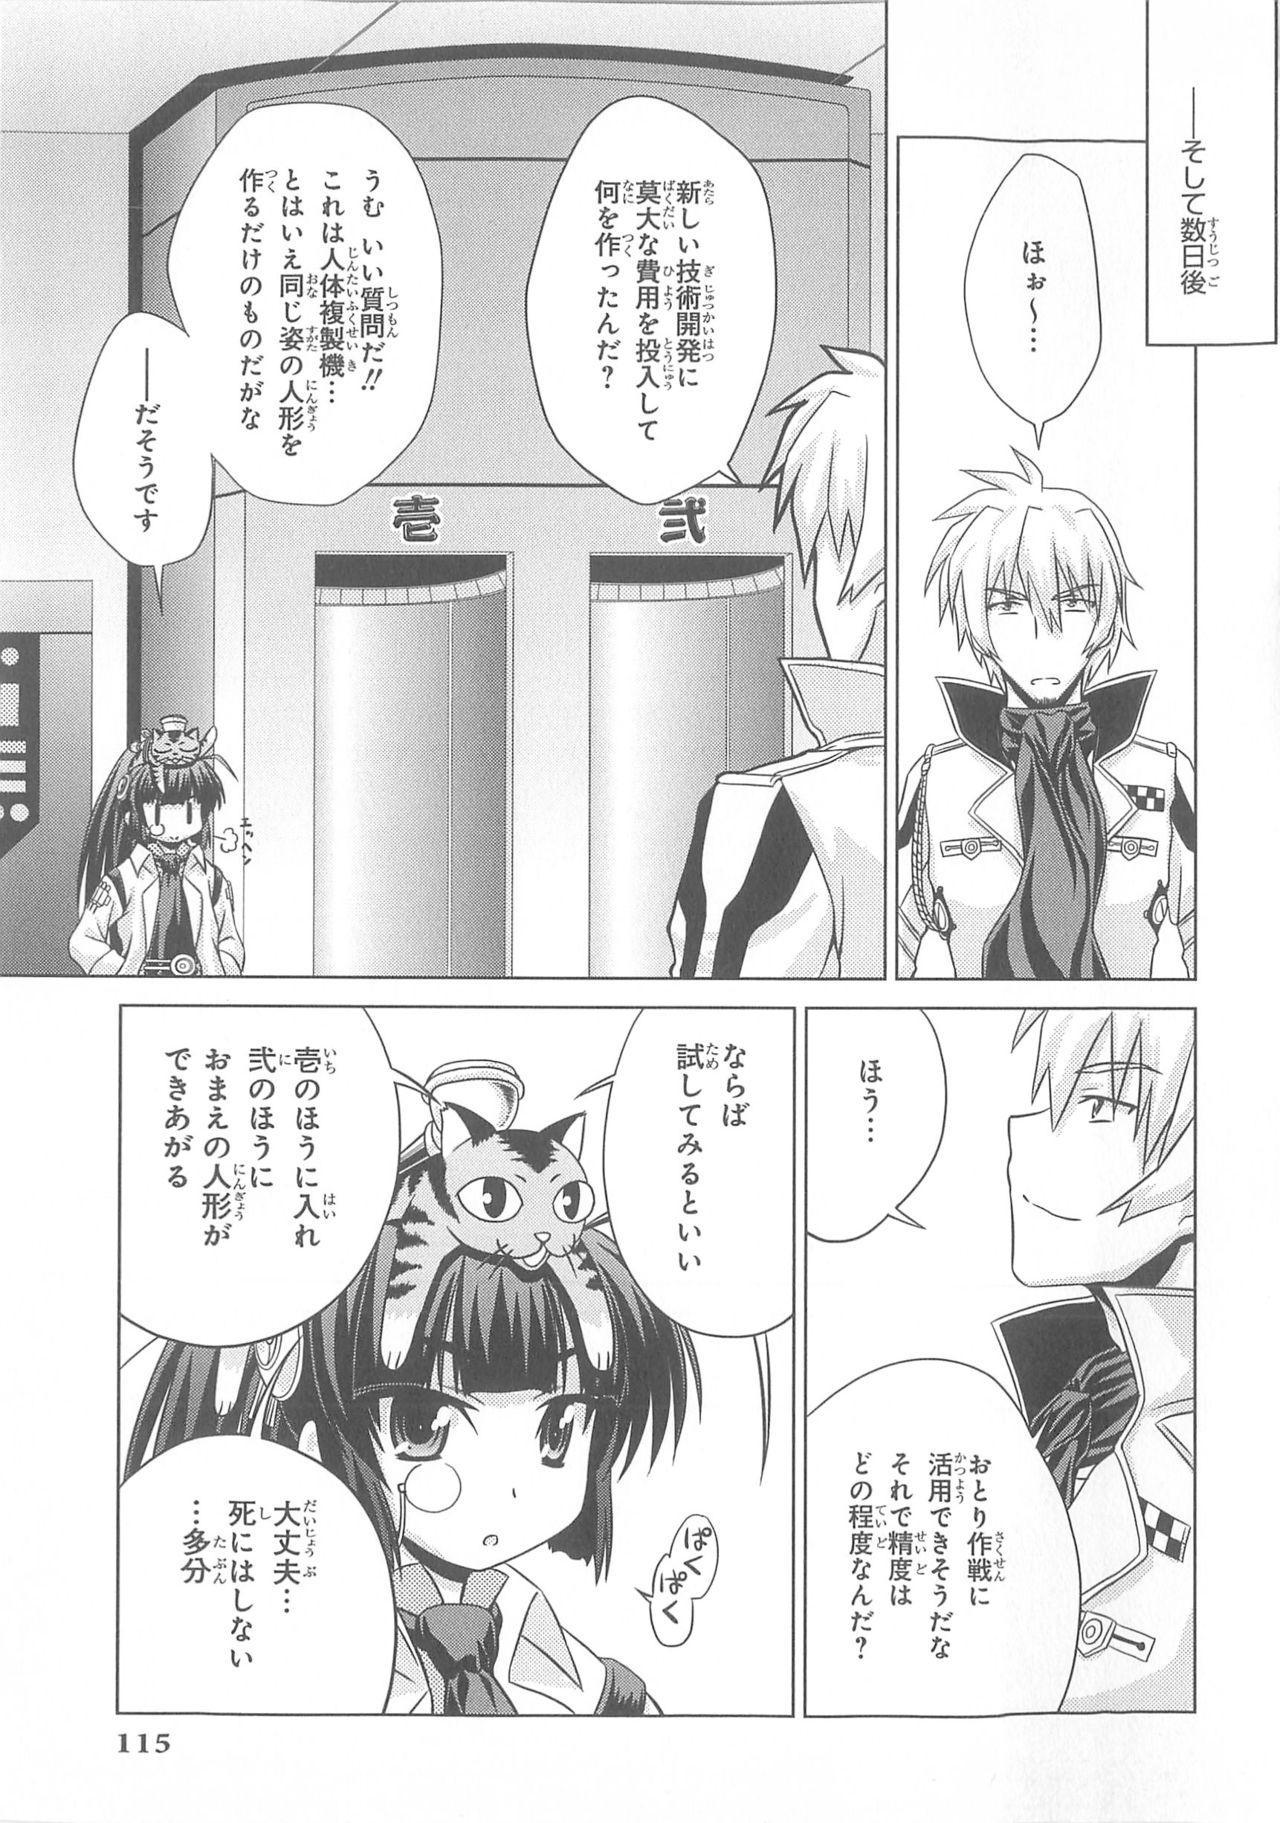 Daiteikoku comic Anthology vol.2 115